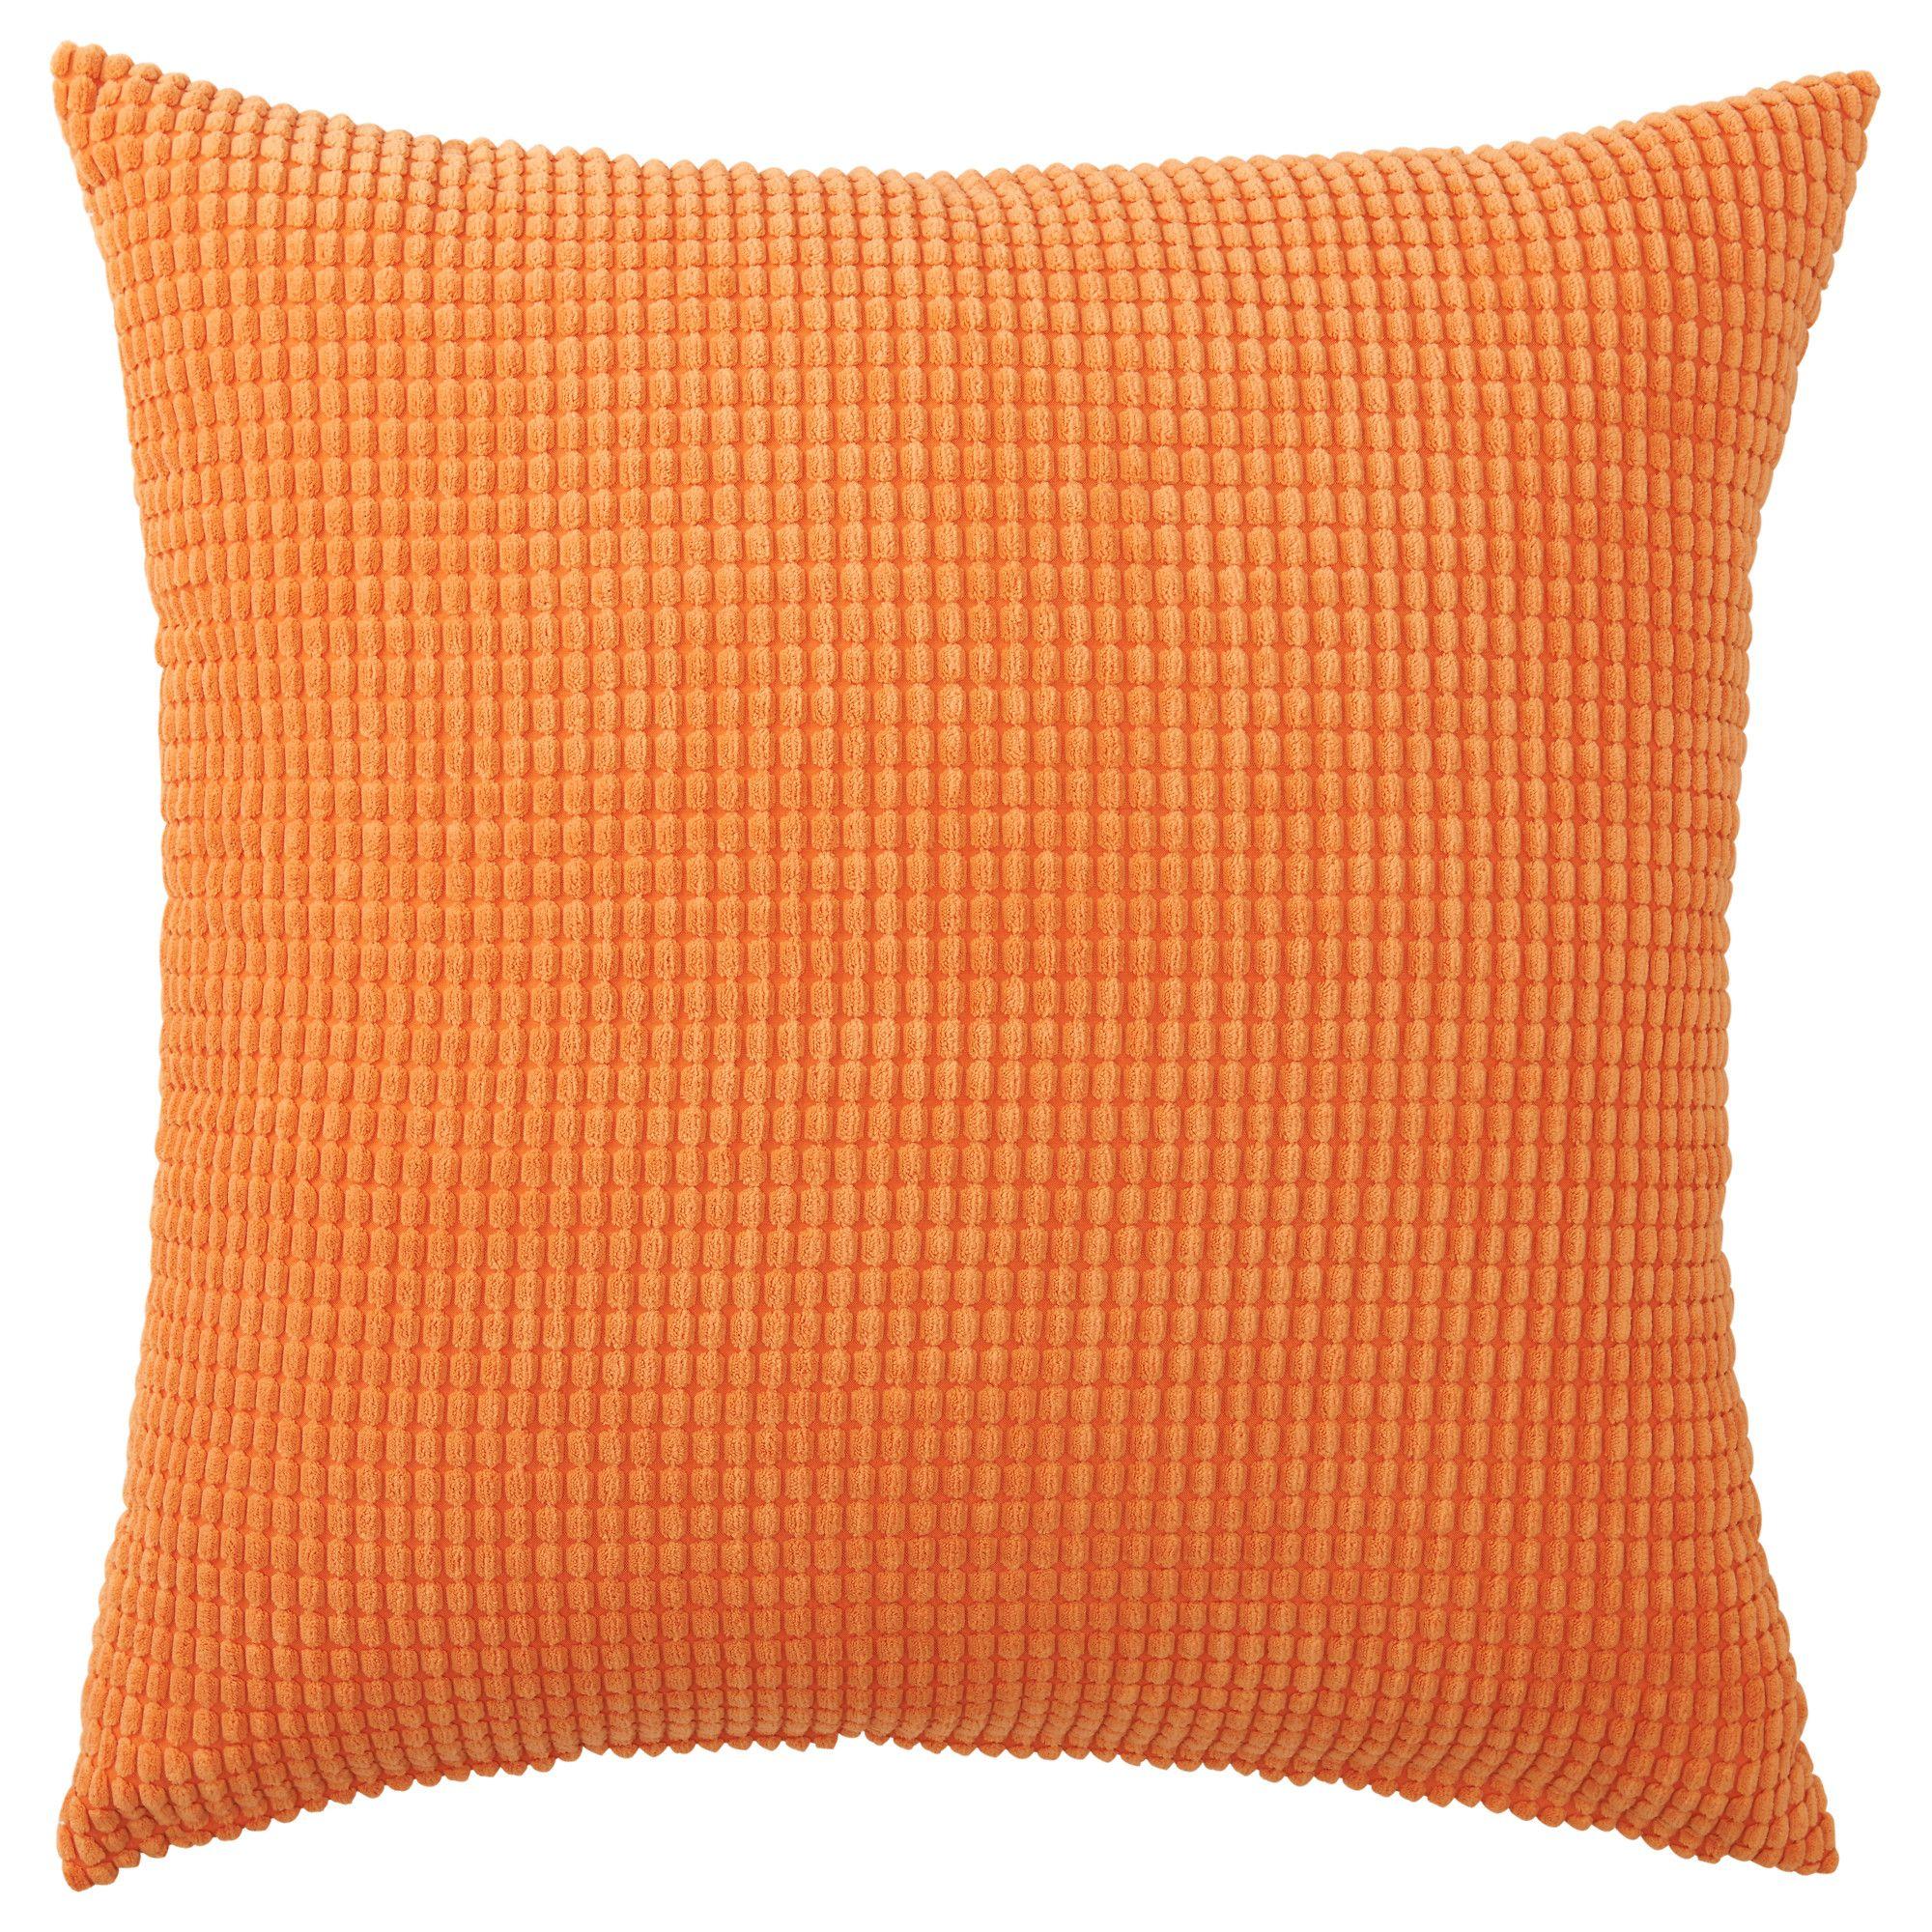 IKEA GULLKLOCKA Cushion cover Chenille fabric feels ultra soft